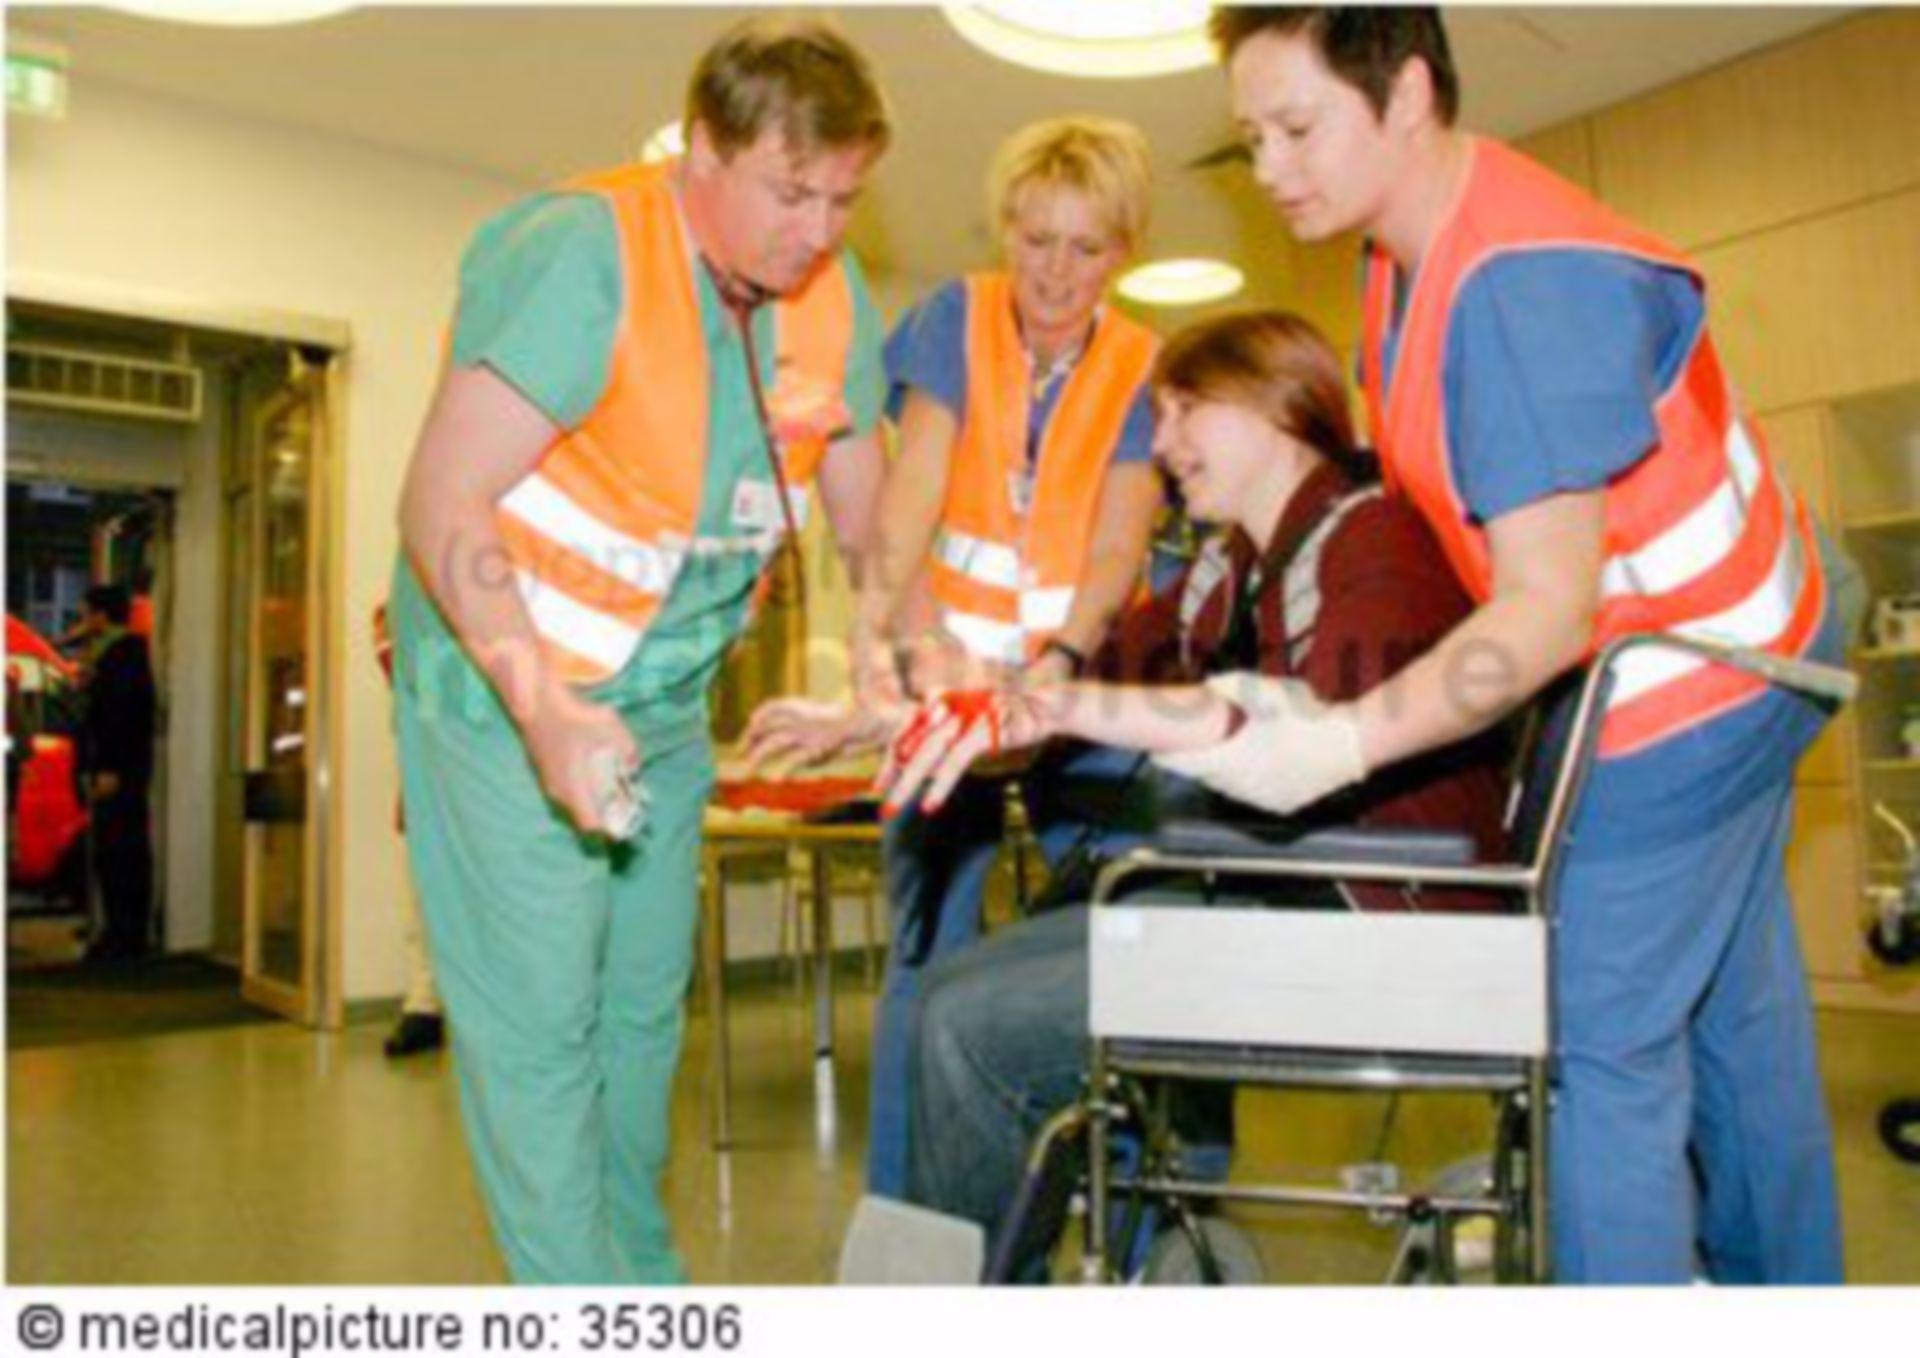 Katastrophenalarm-Übung